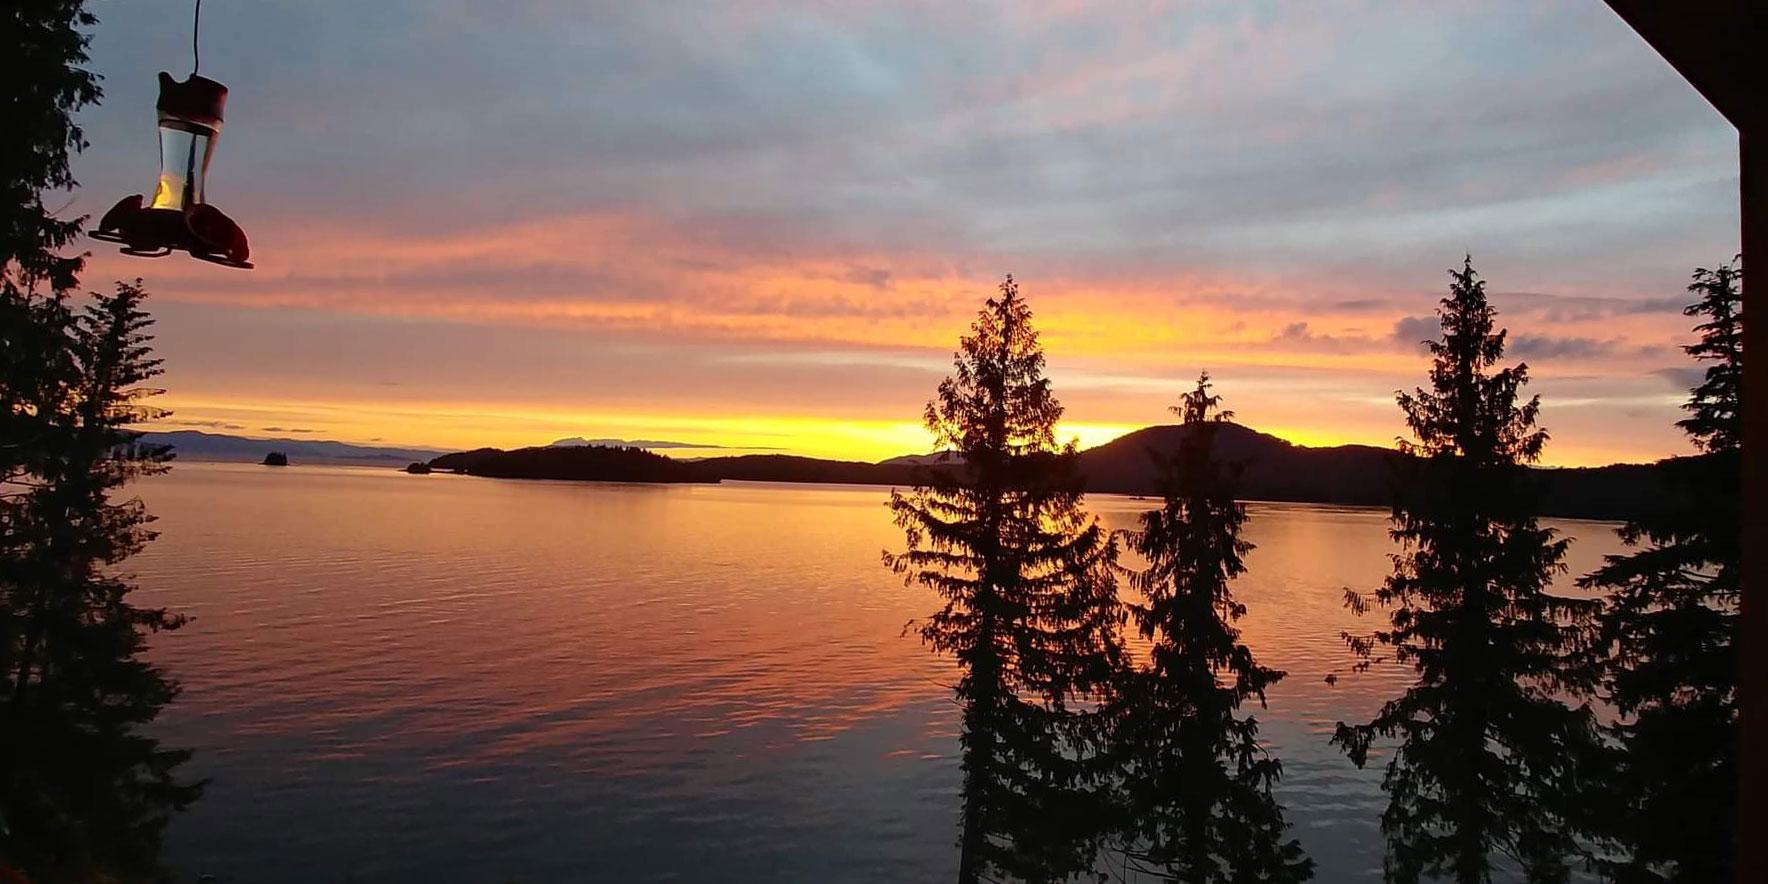 Private Oceanside Lodge View of Sunset - Ketchikan, Alaska: Anglers Adventure's Lodge